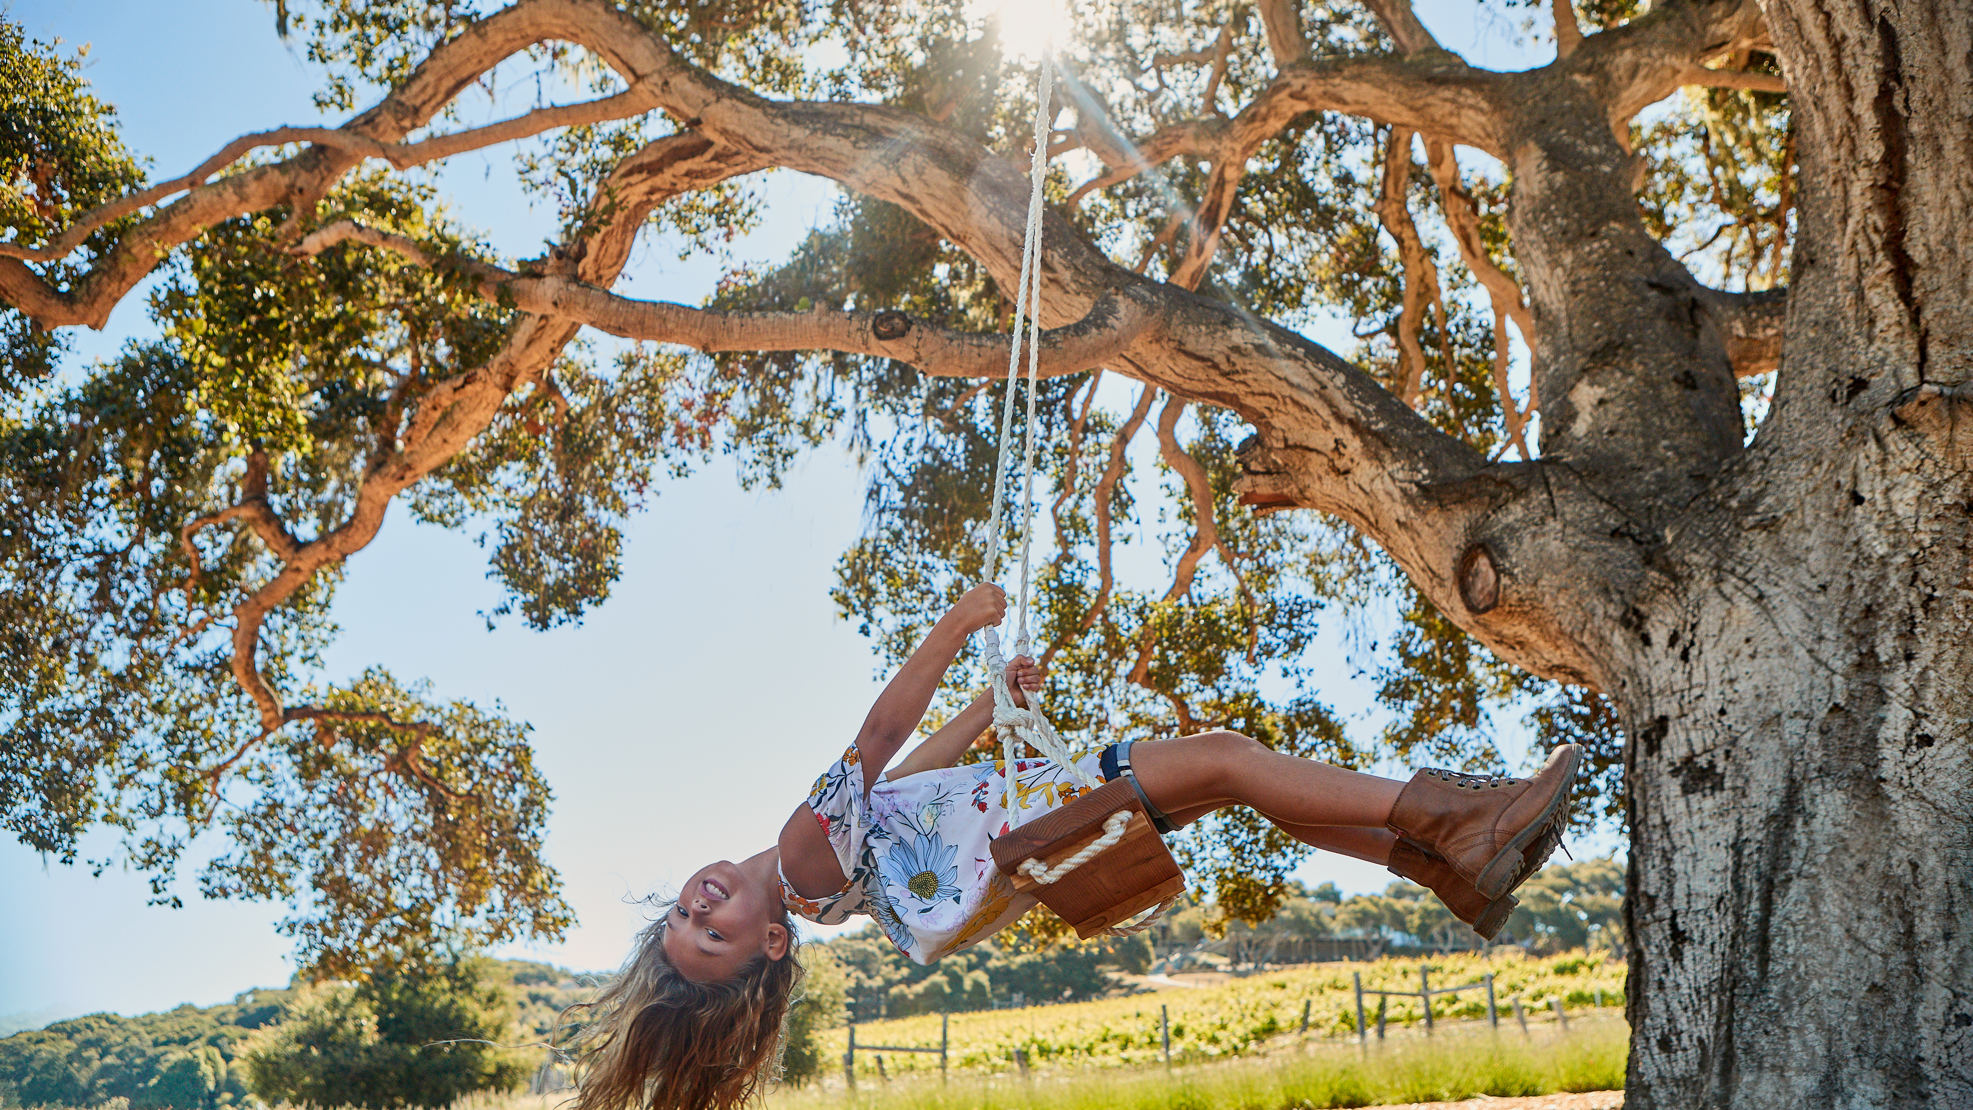 Carmel Valley Ranch_Lifestyle_Play_girl on swing_hair down_2296_GJ